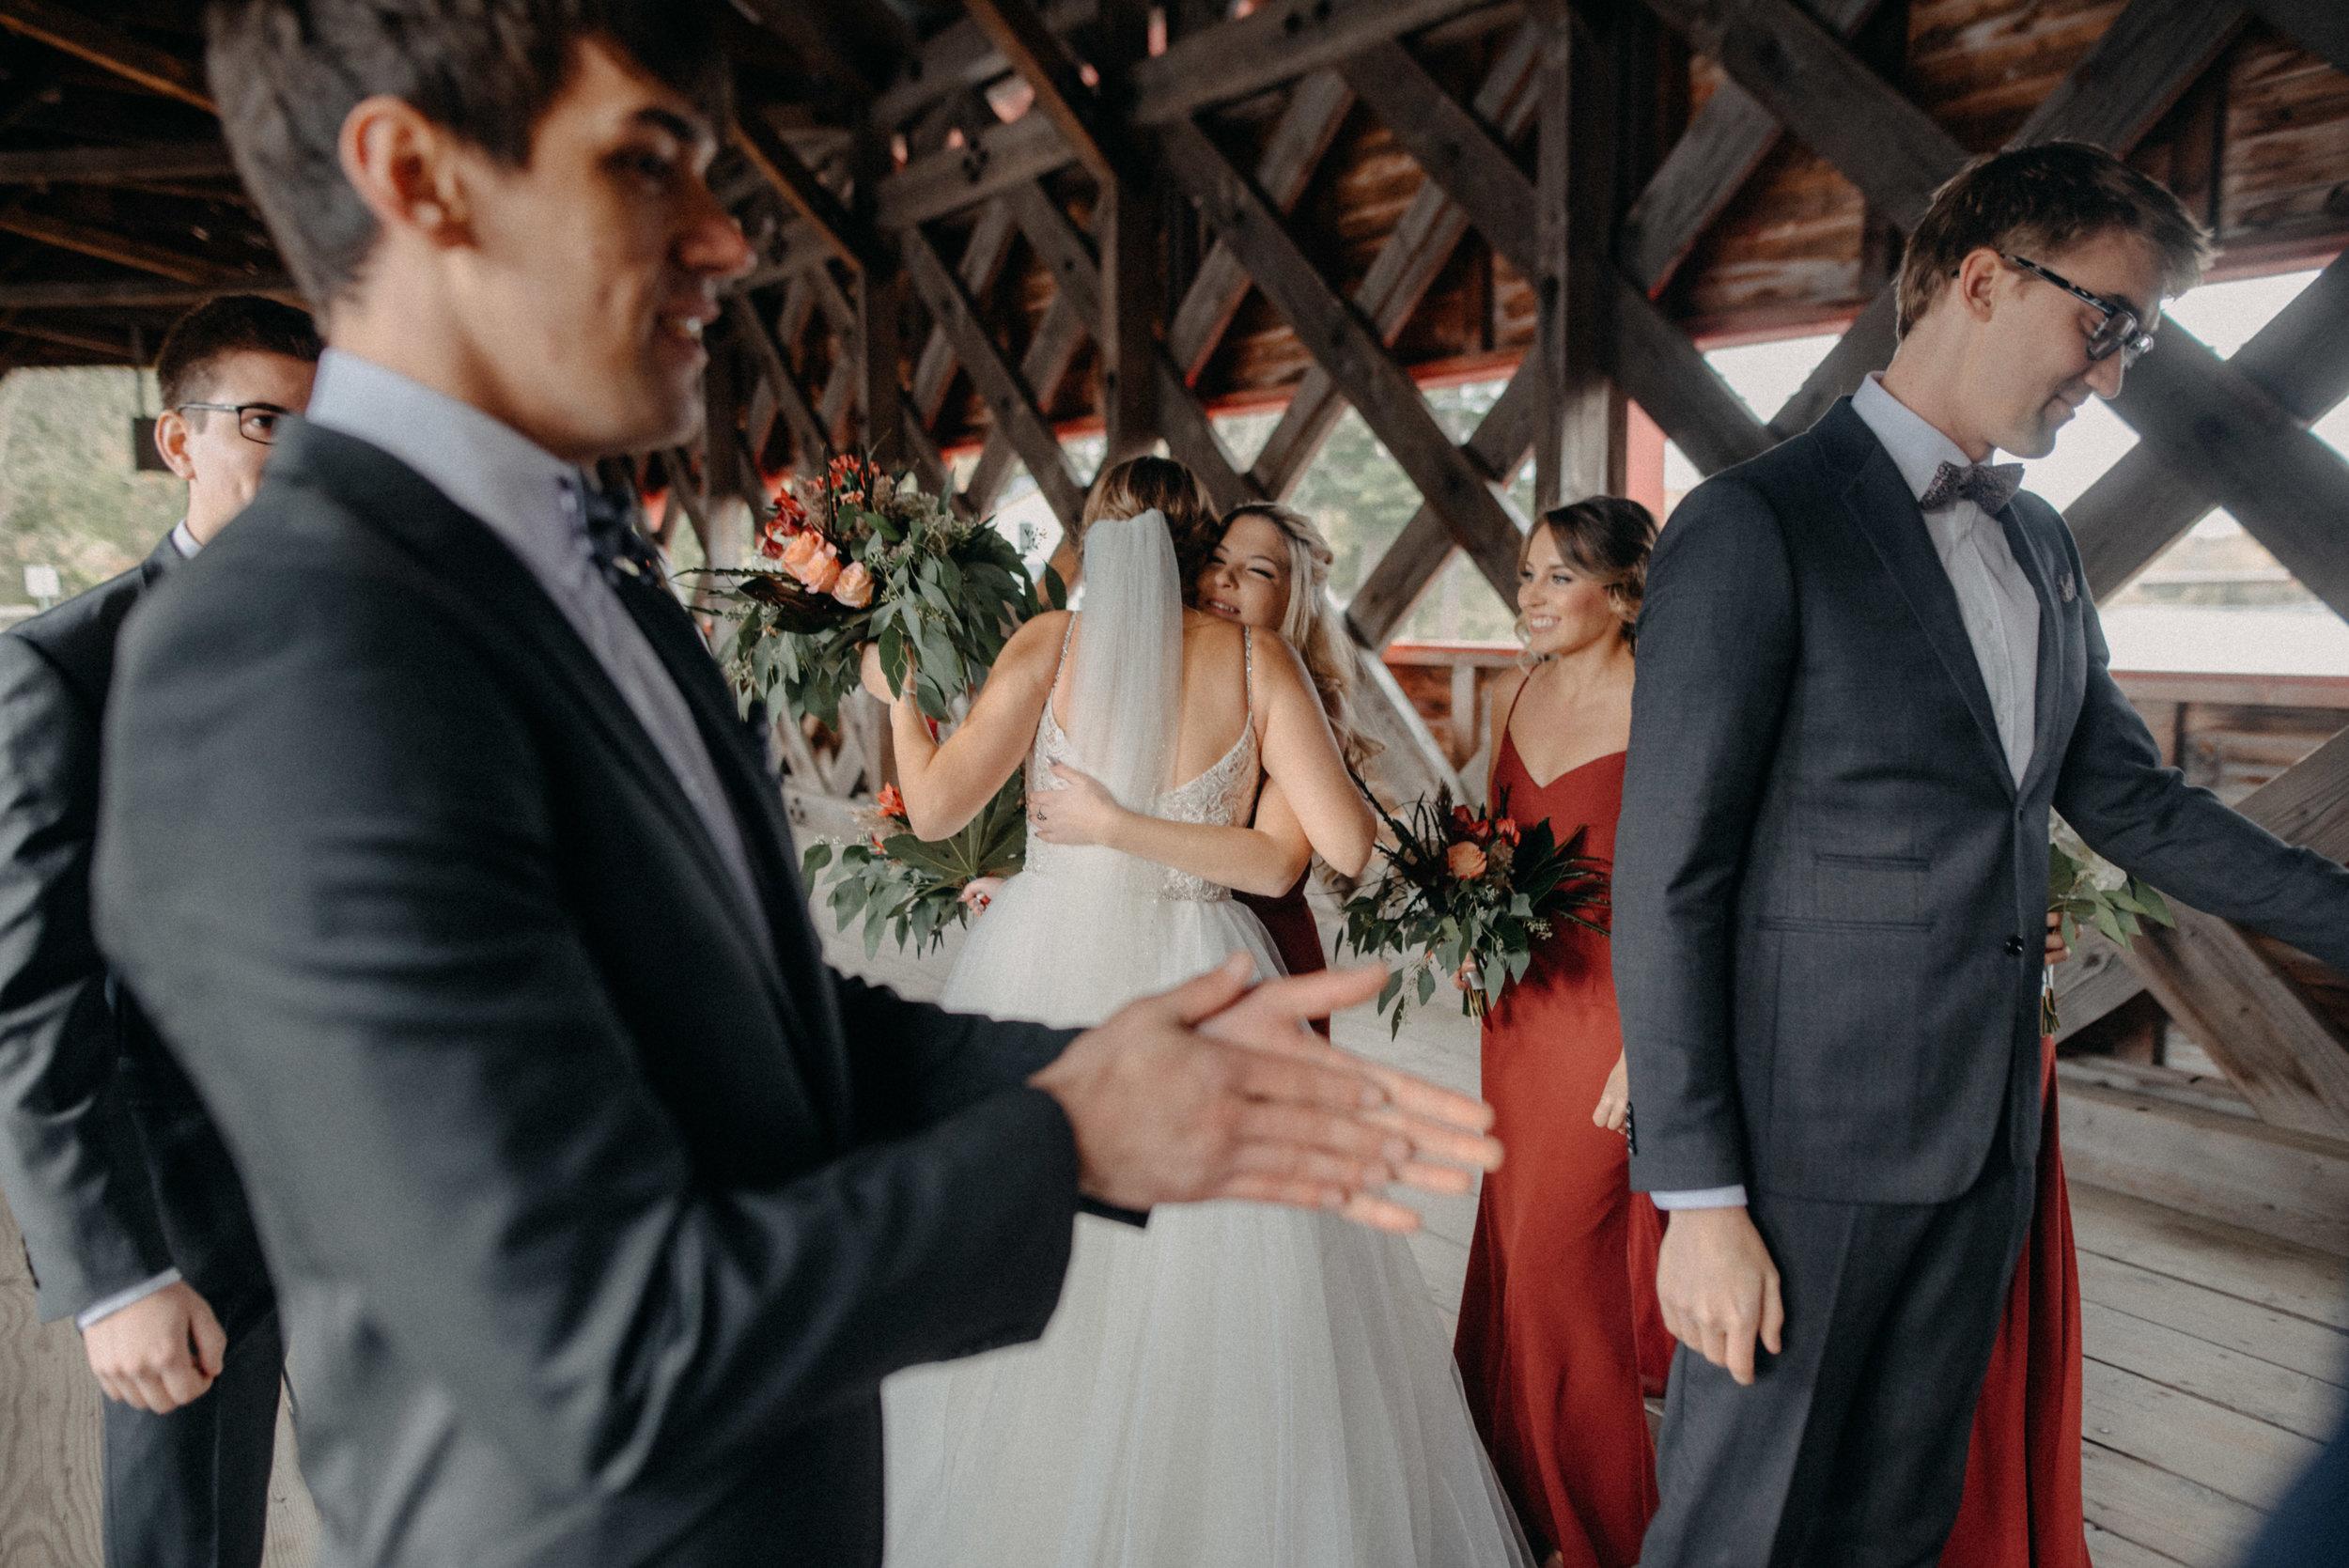 photographe_gatineau_mariage_ottawa_photographer_wedding_natasha_liard_photo_documentary_candid_lifestyle_wakefield_mill_red_bridge (36).jpg